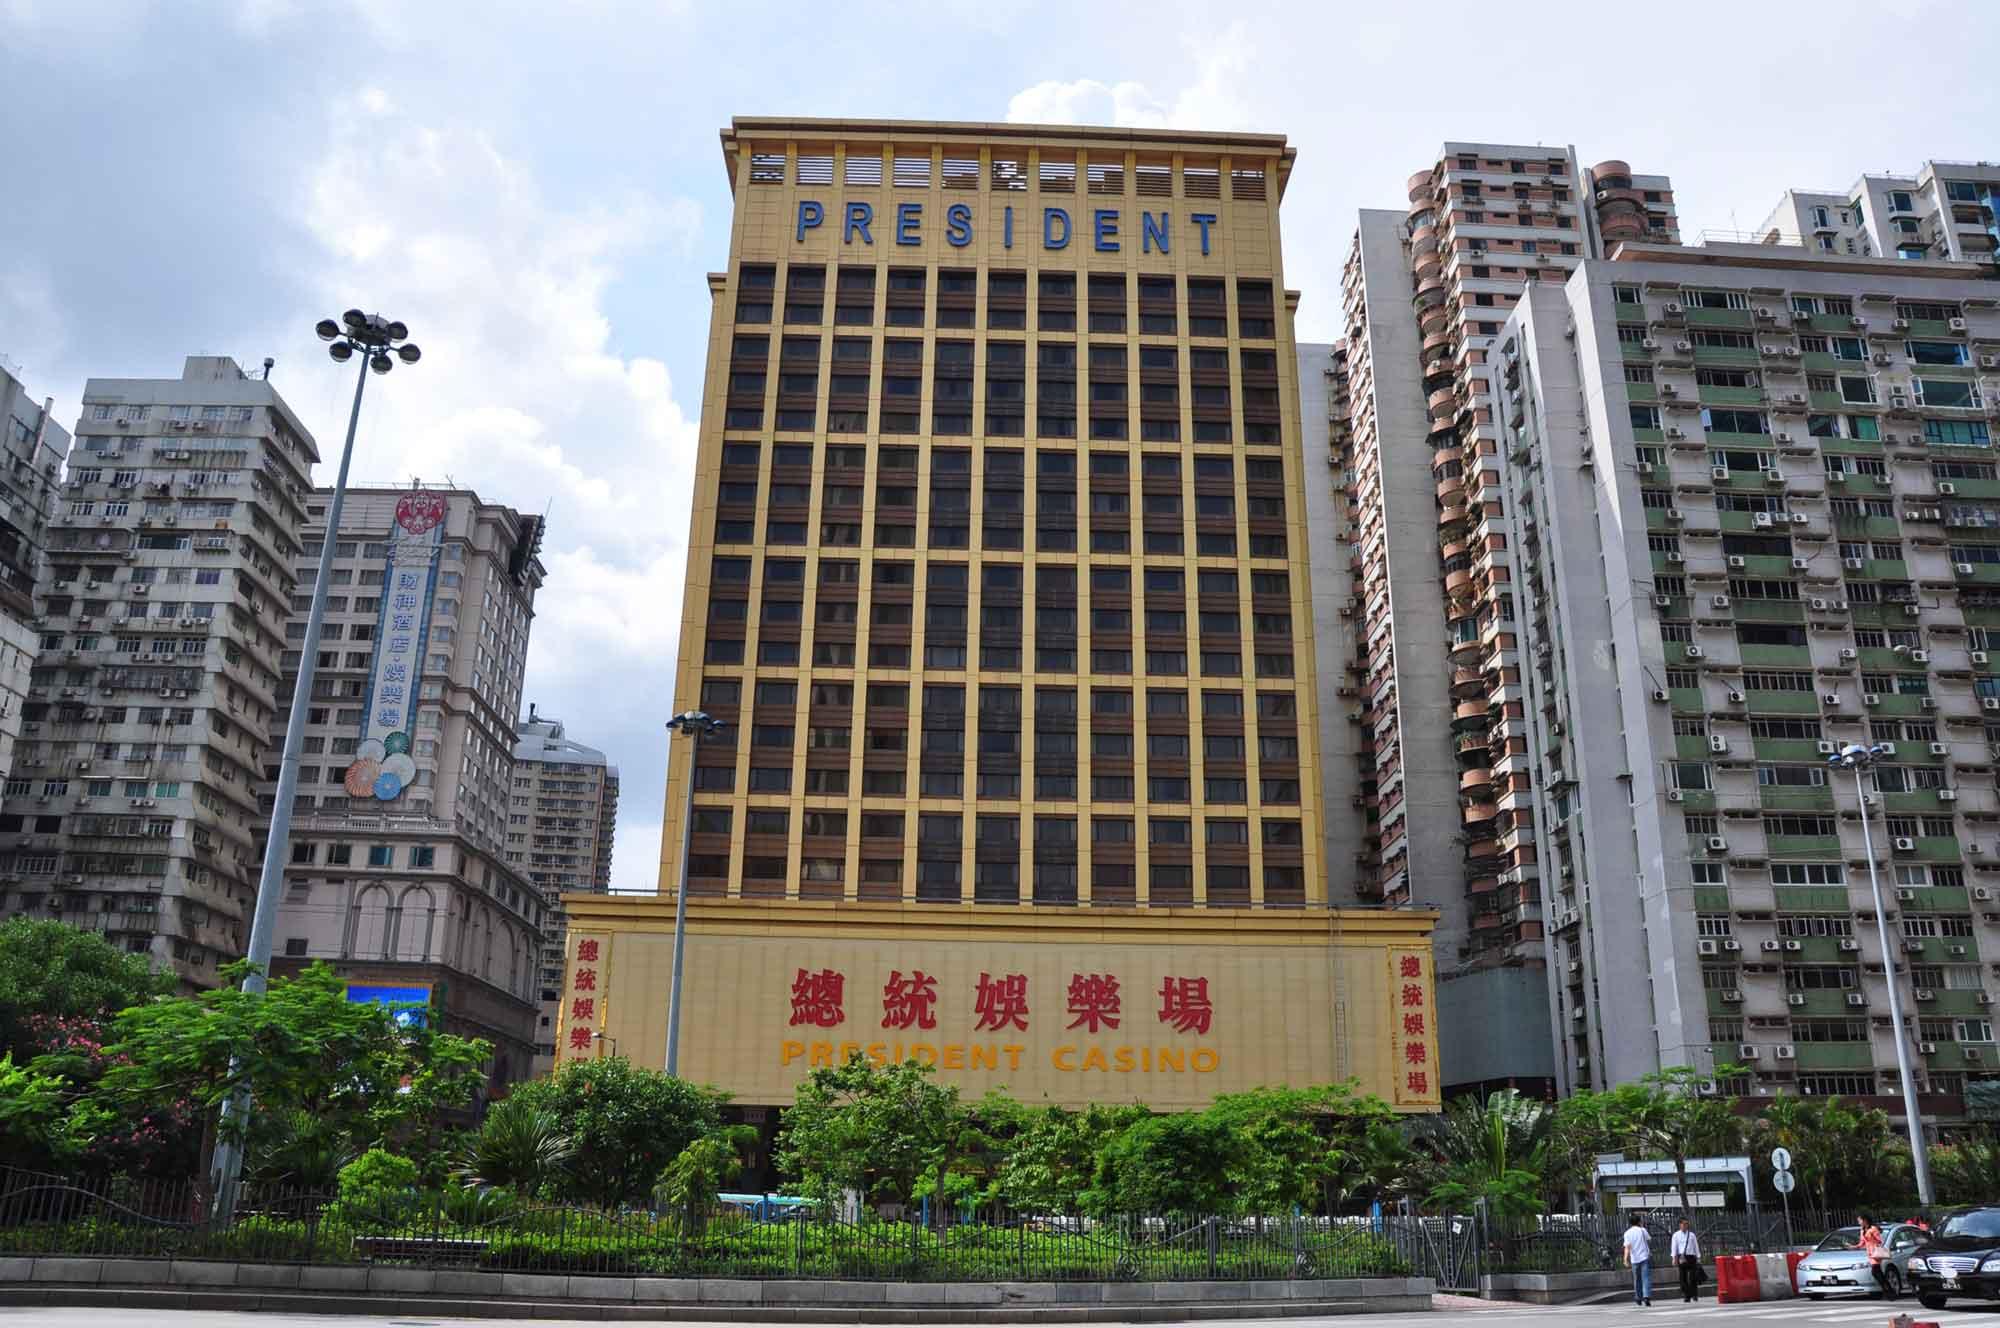 Preident Hotel Macau